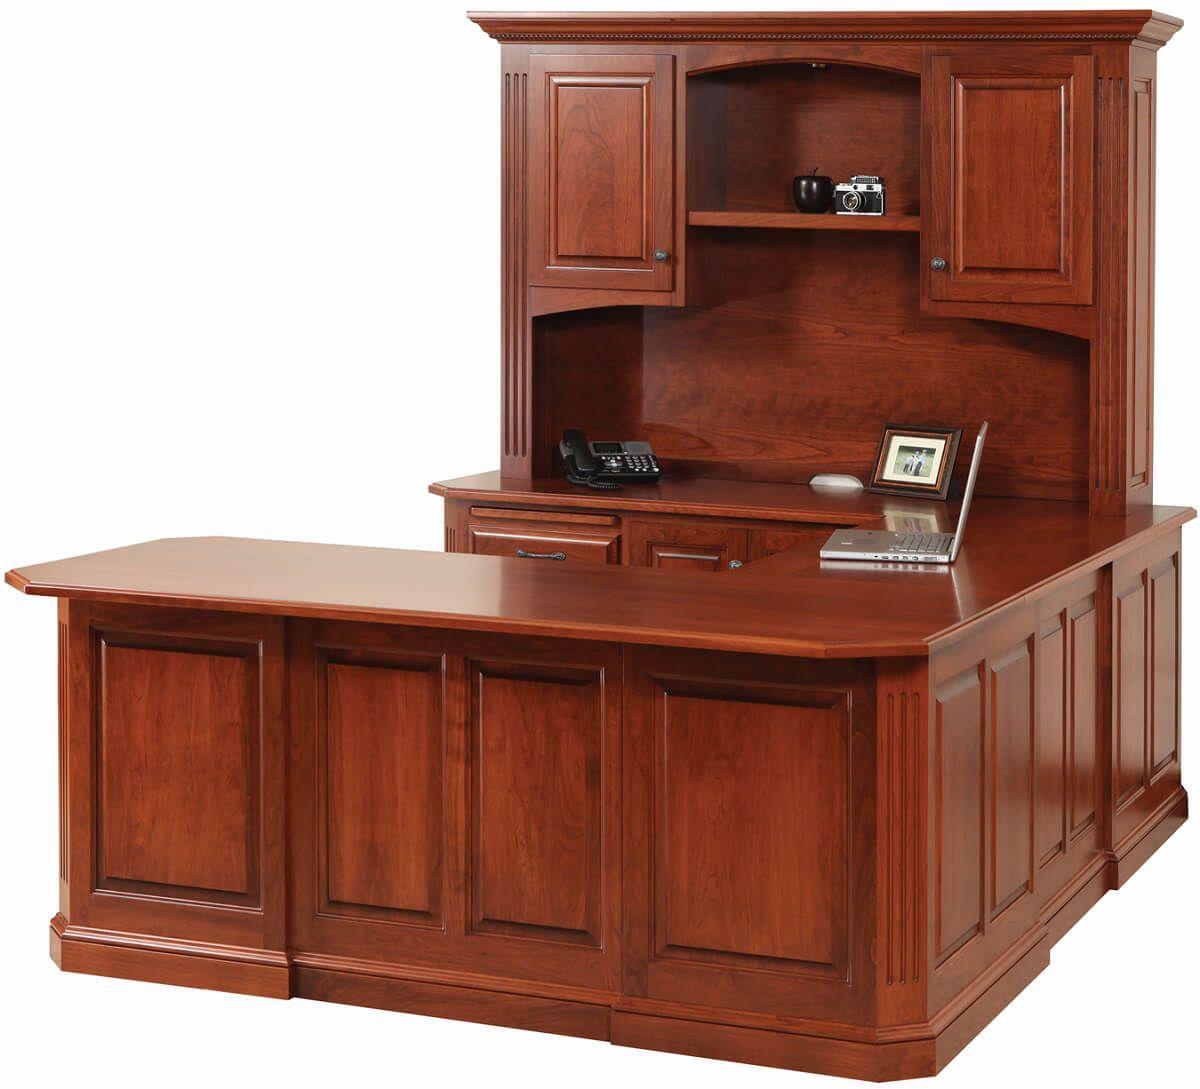 Cavalier Cherry U Shaped Desk Countryside Amish Furniture